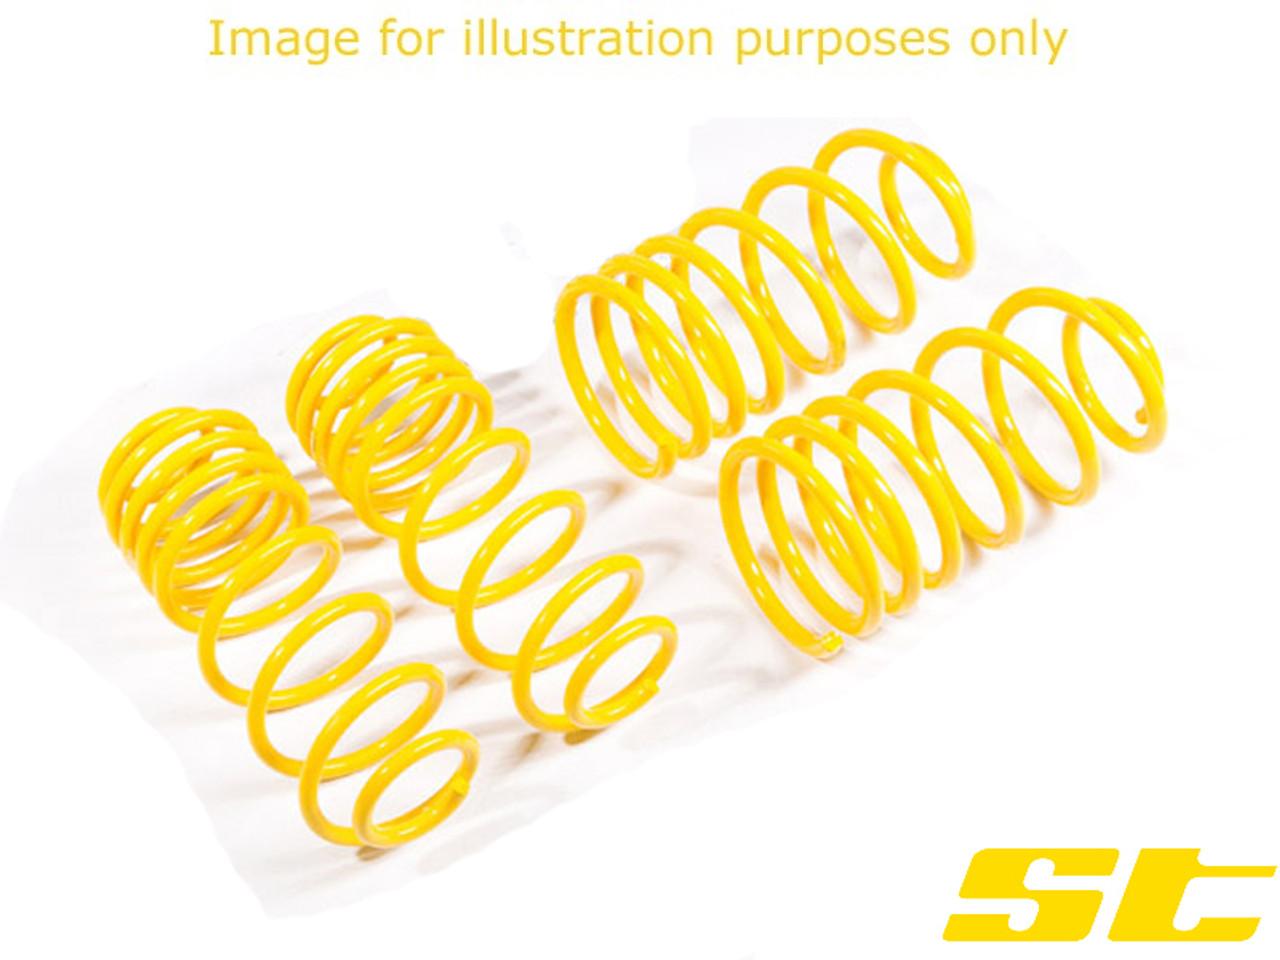 ST Suspension Lowering Springs - VW Vento (1H)